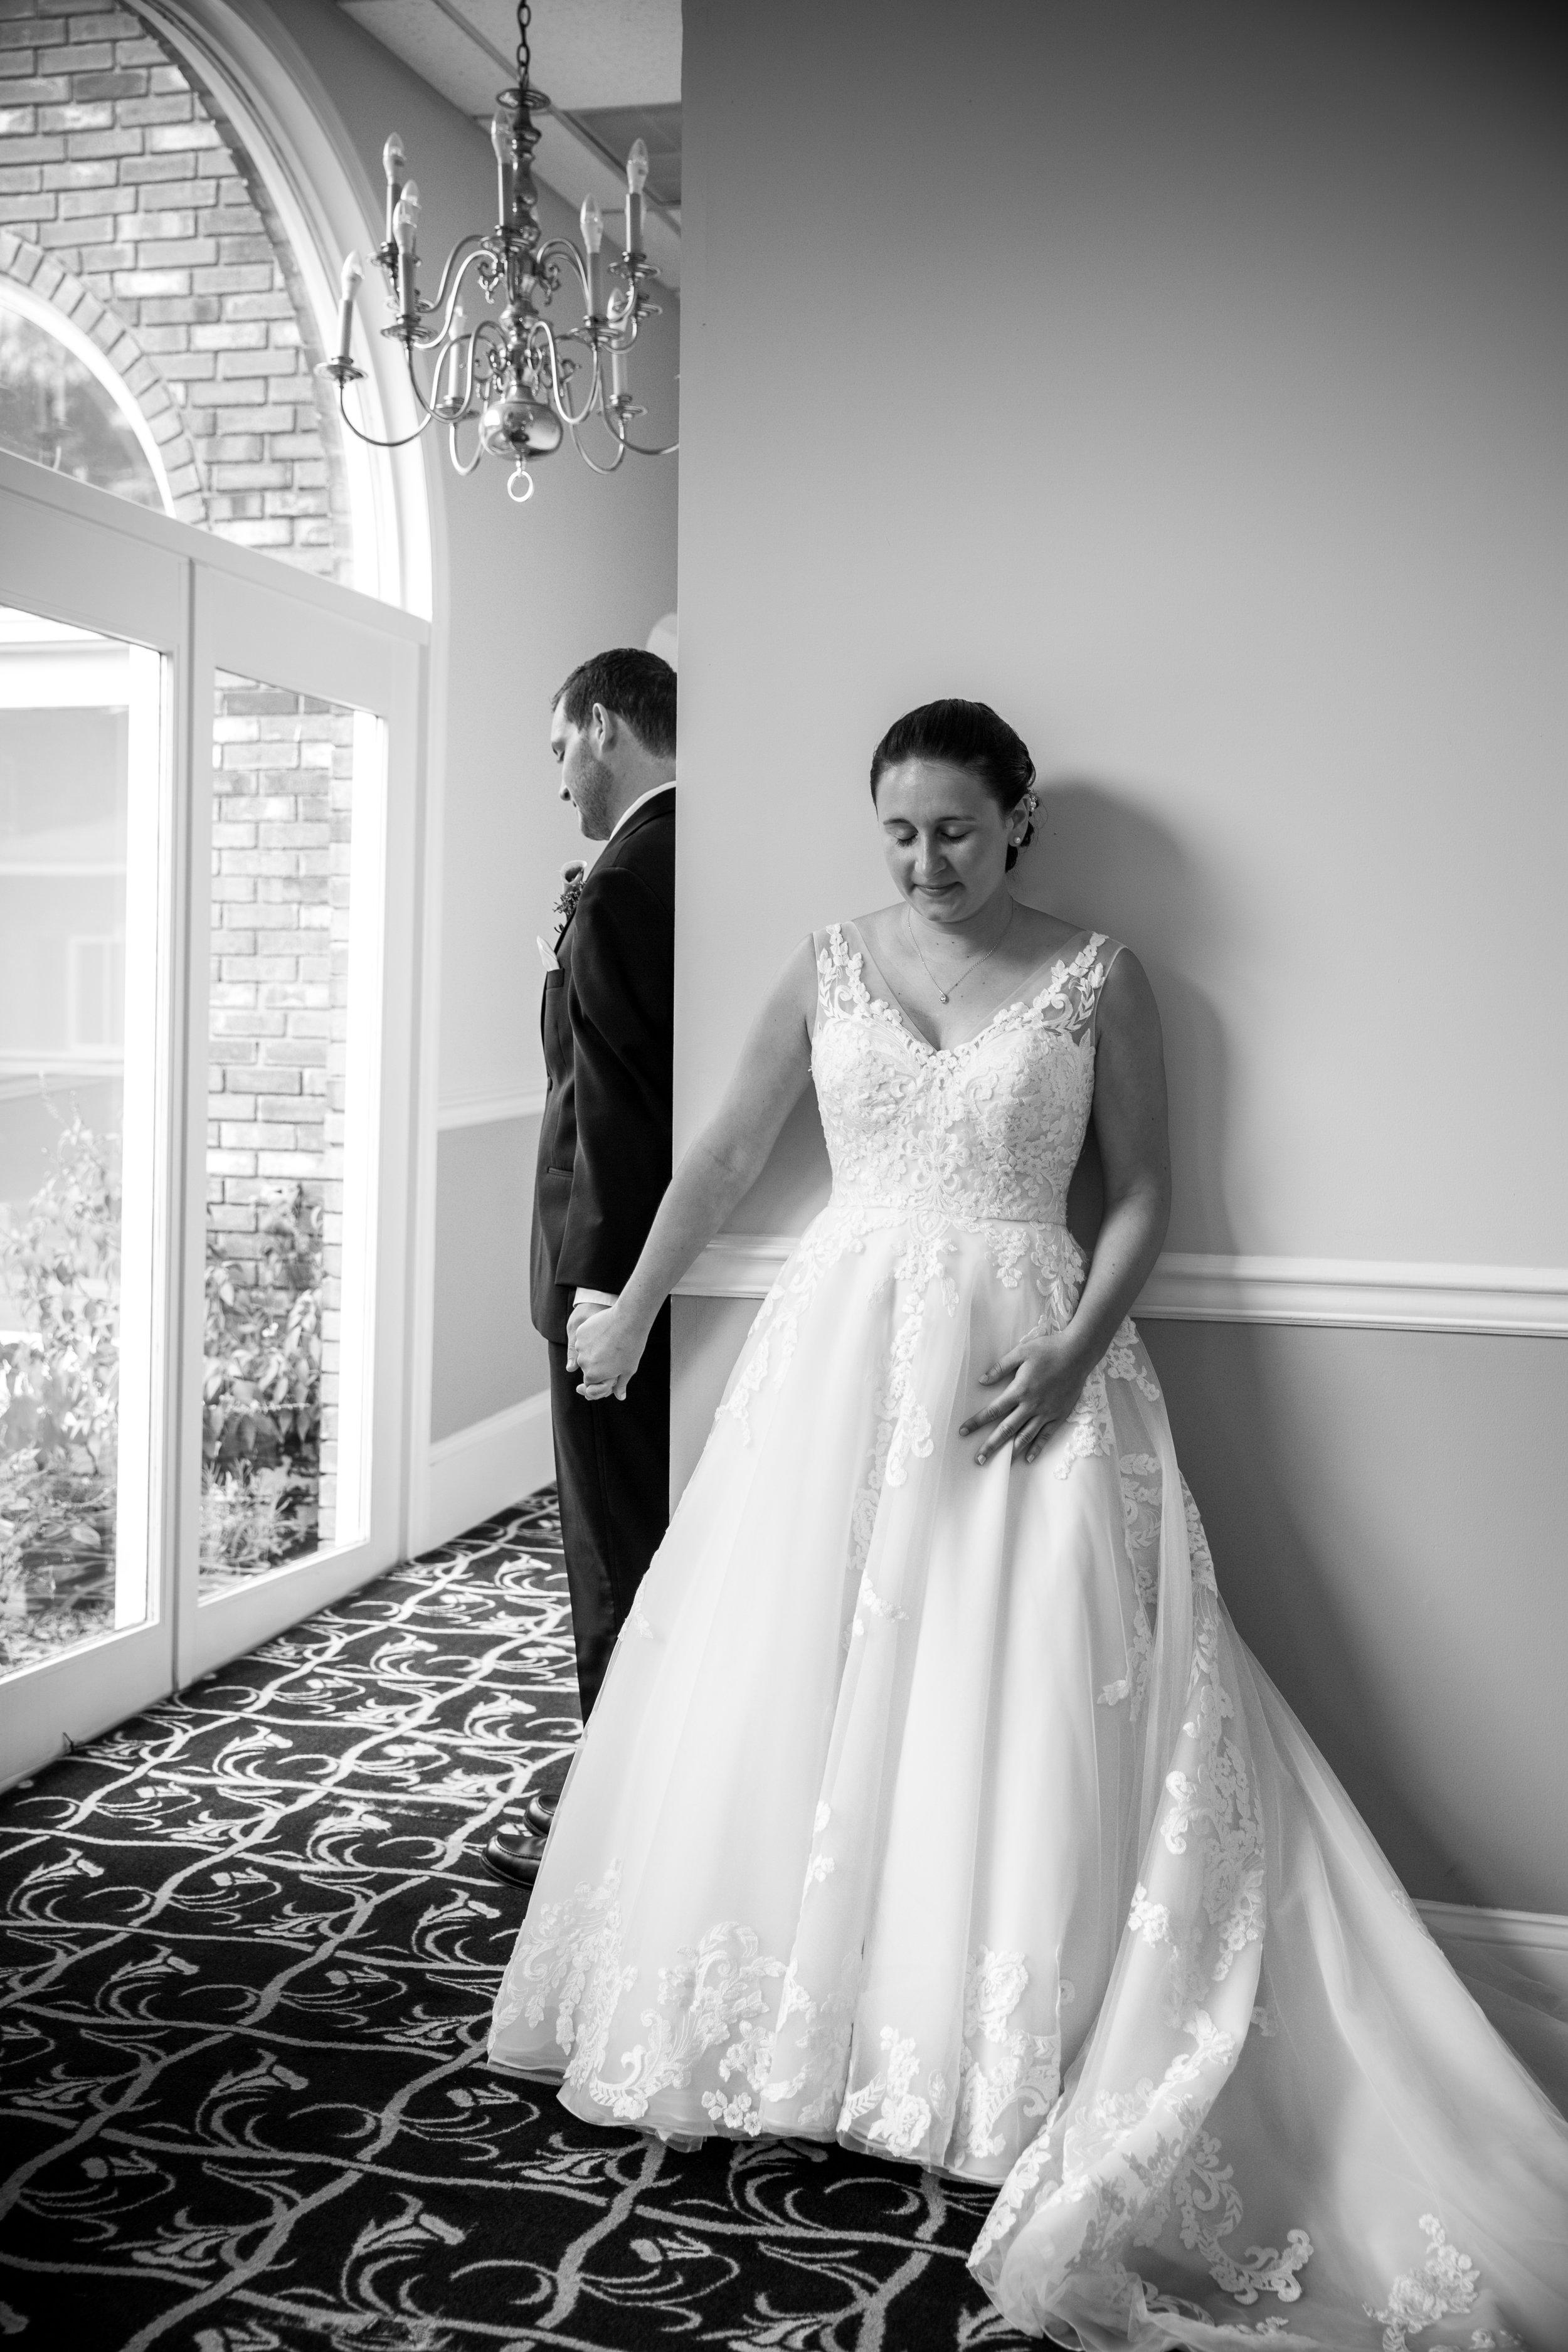 Hapeman Wedding 8.6.16-137.JPG